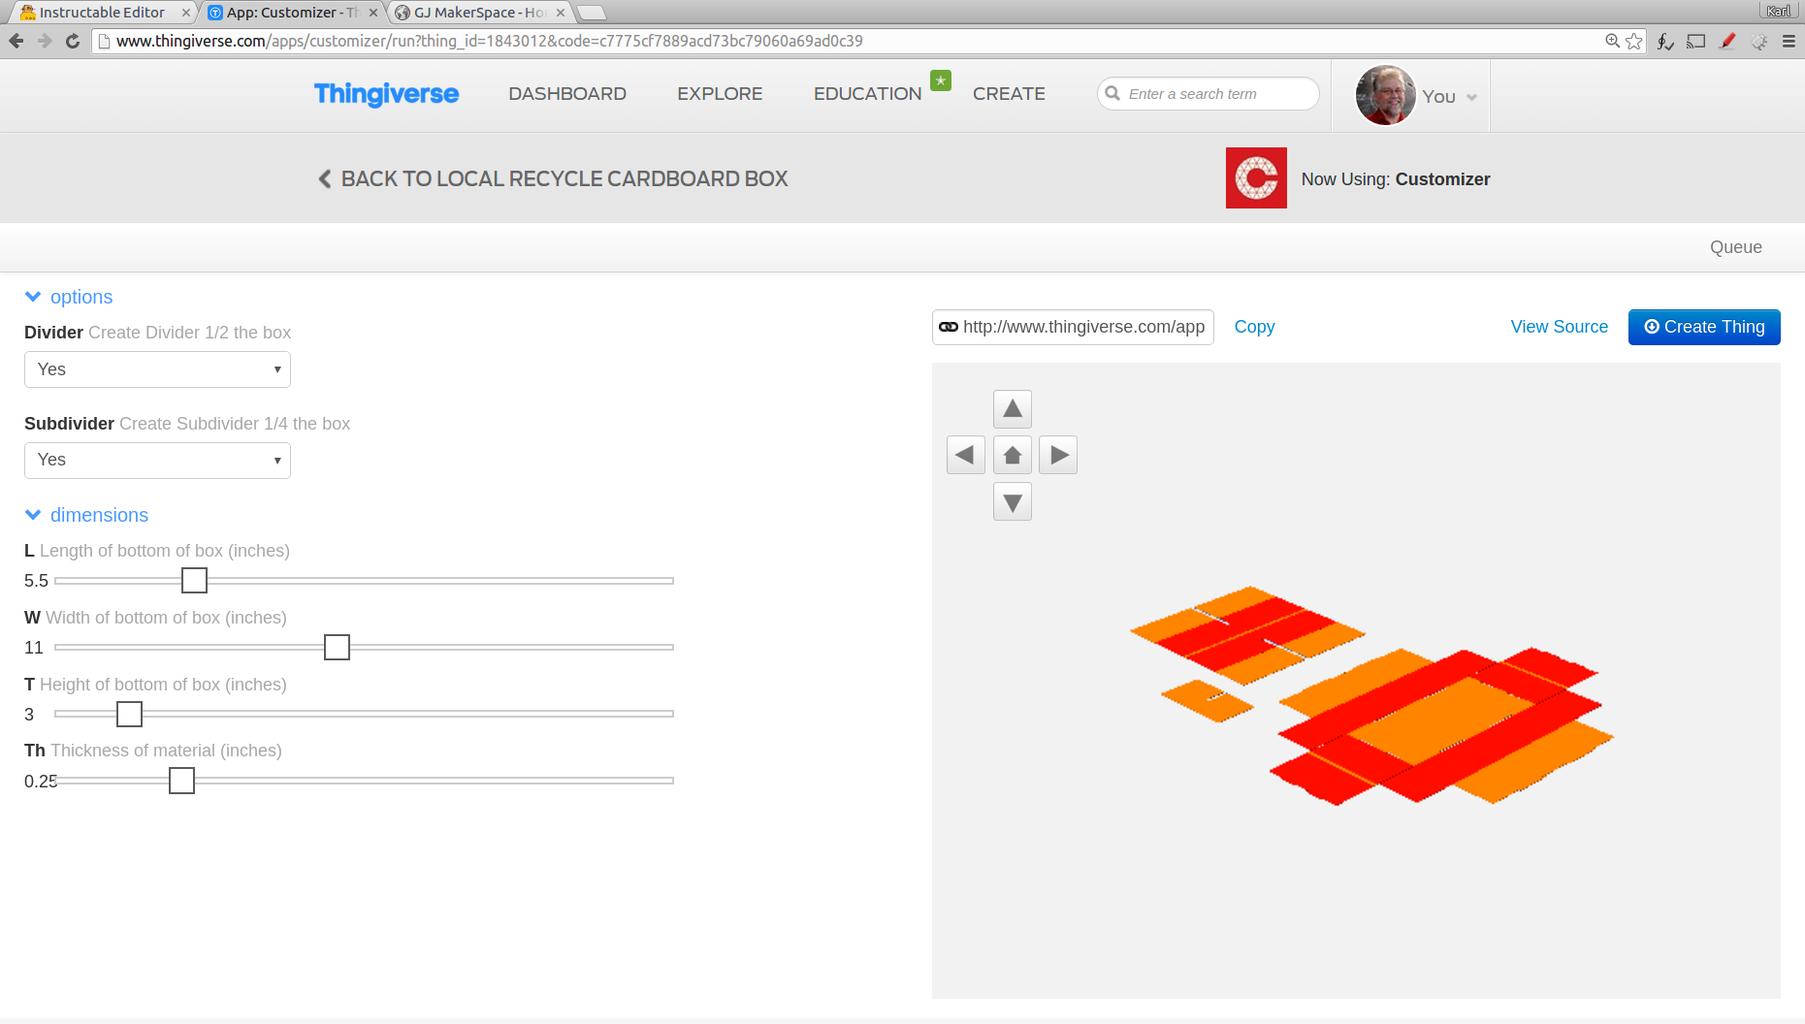 Customize Your Box Design